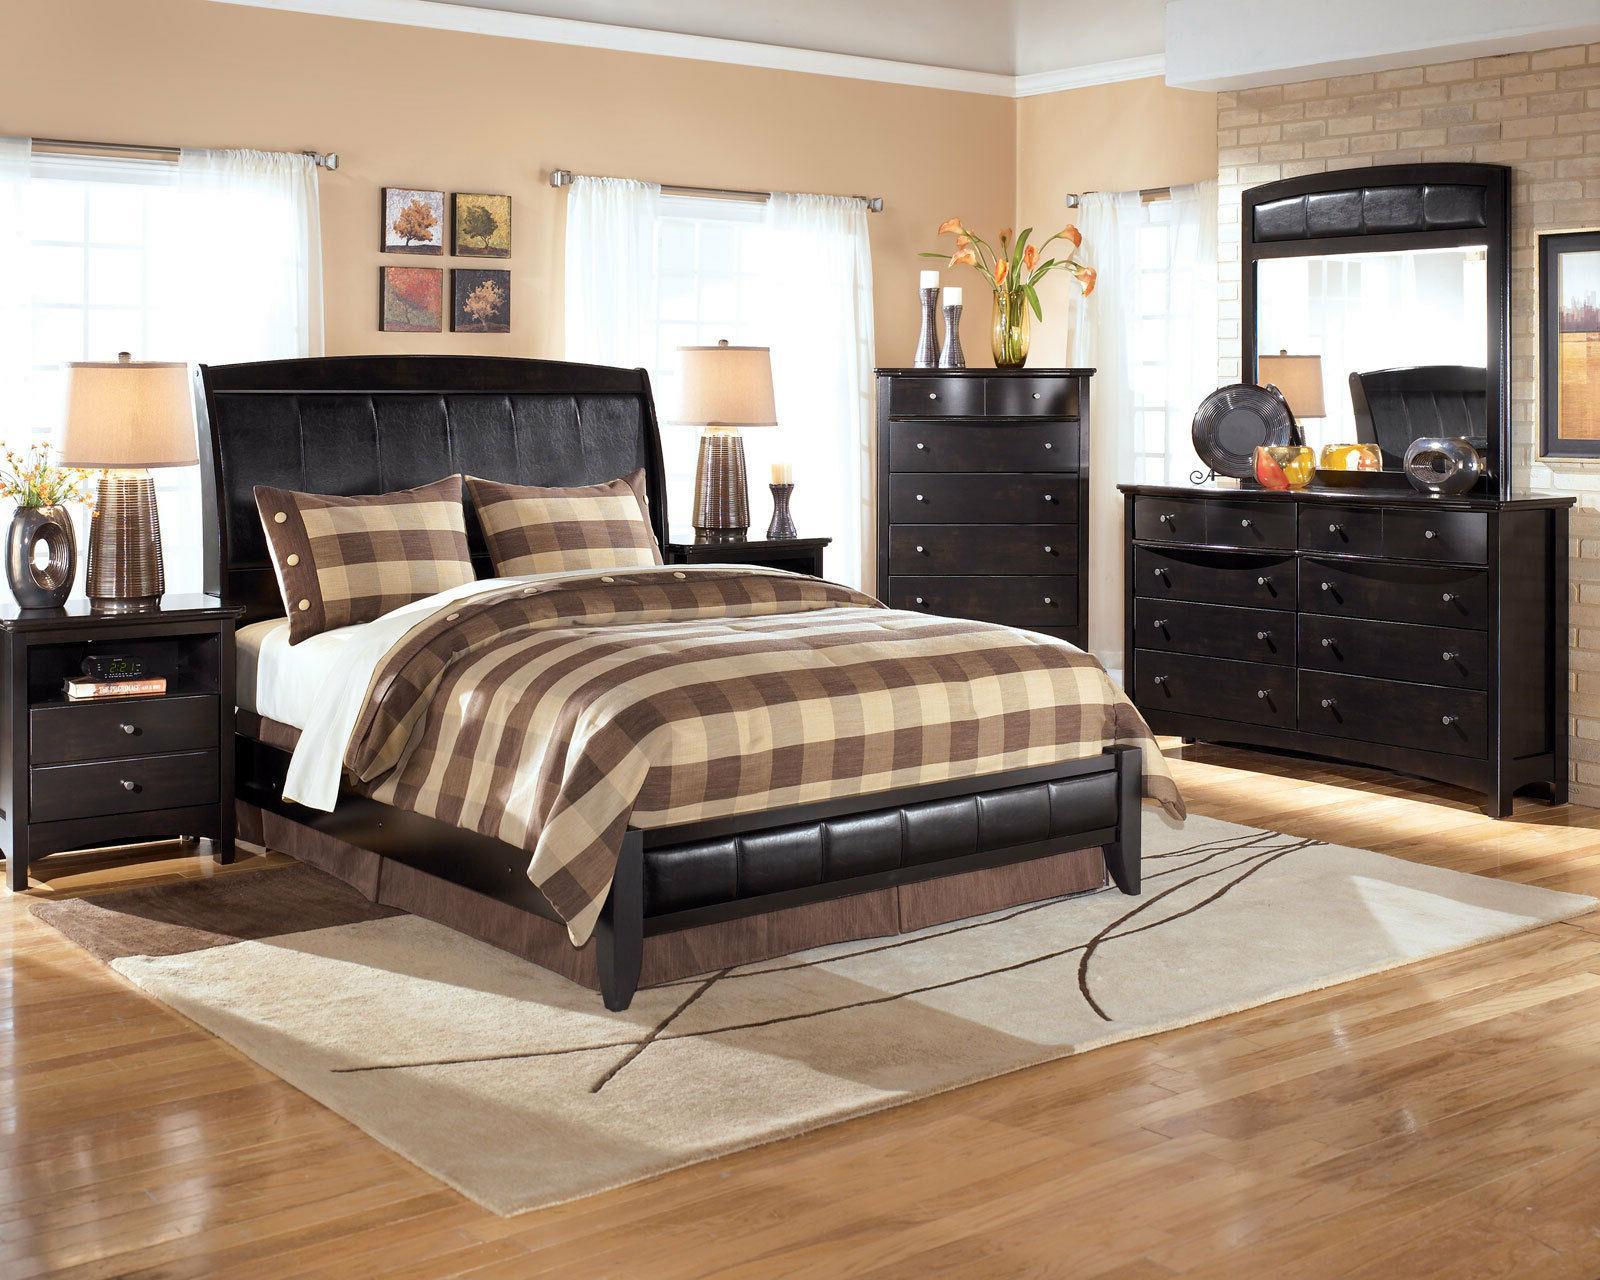 Ashley Furniture B208 Harmony - Modern Queen or King Panel B